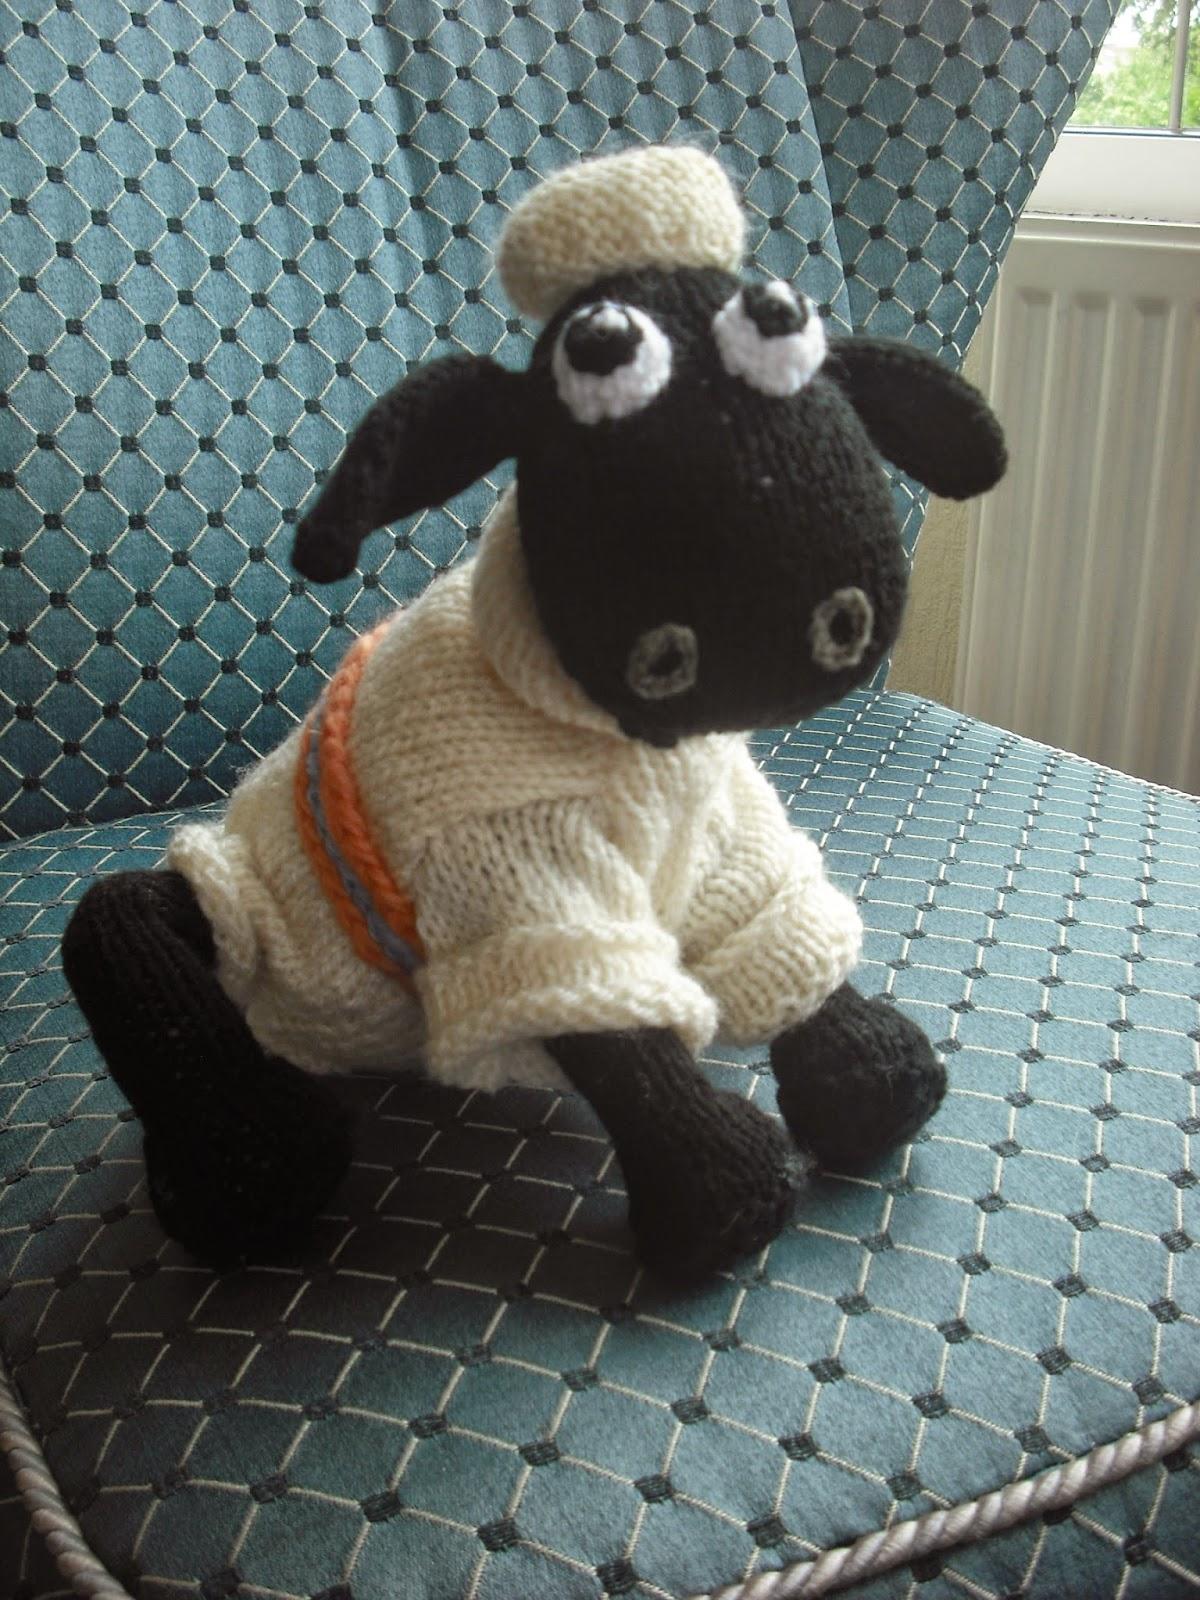 Wool - n - Art: SHAUN THE SHEEP